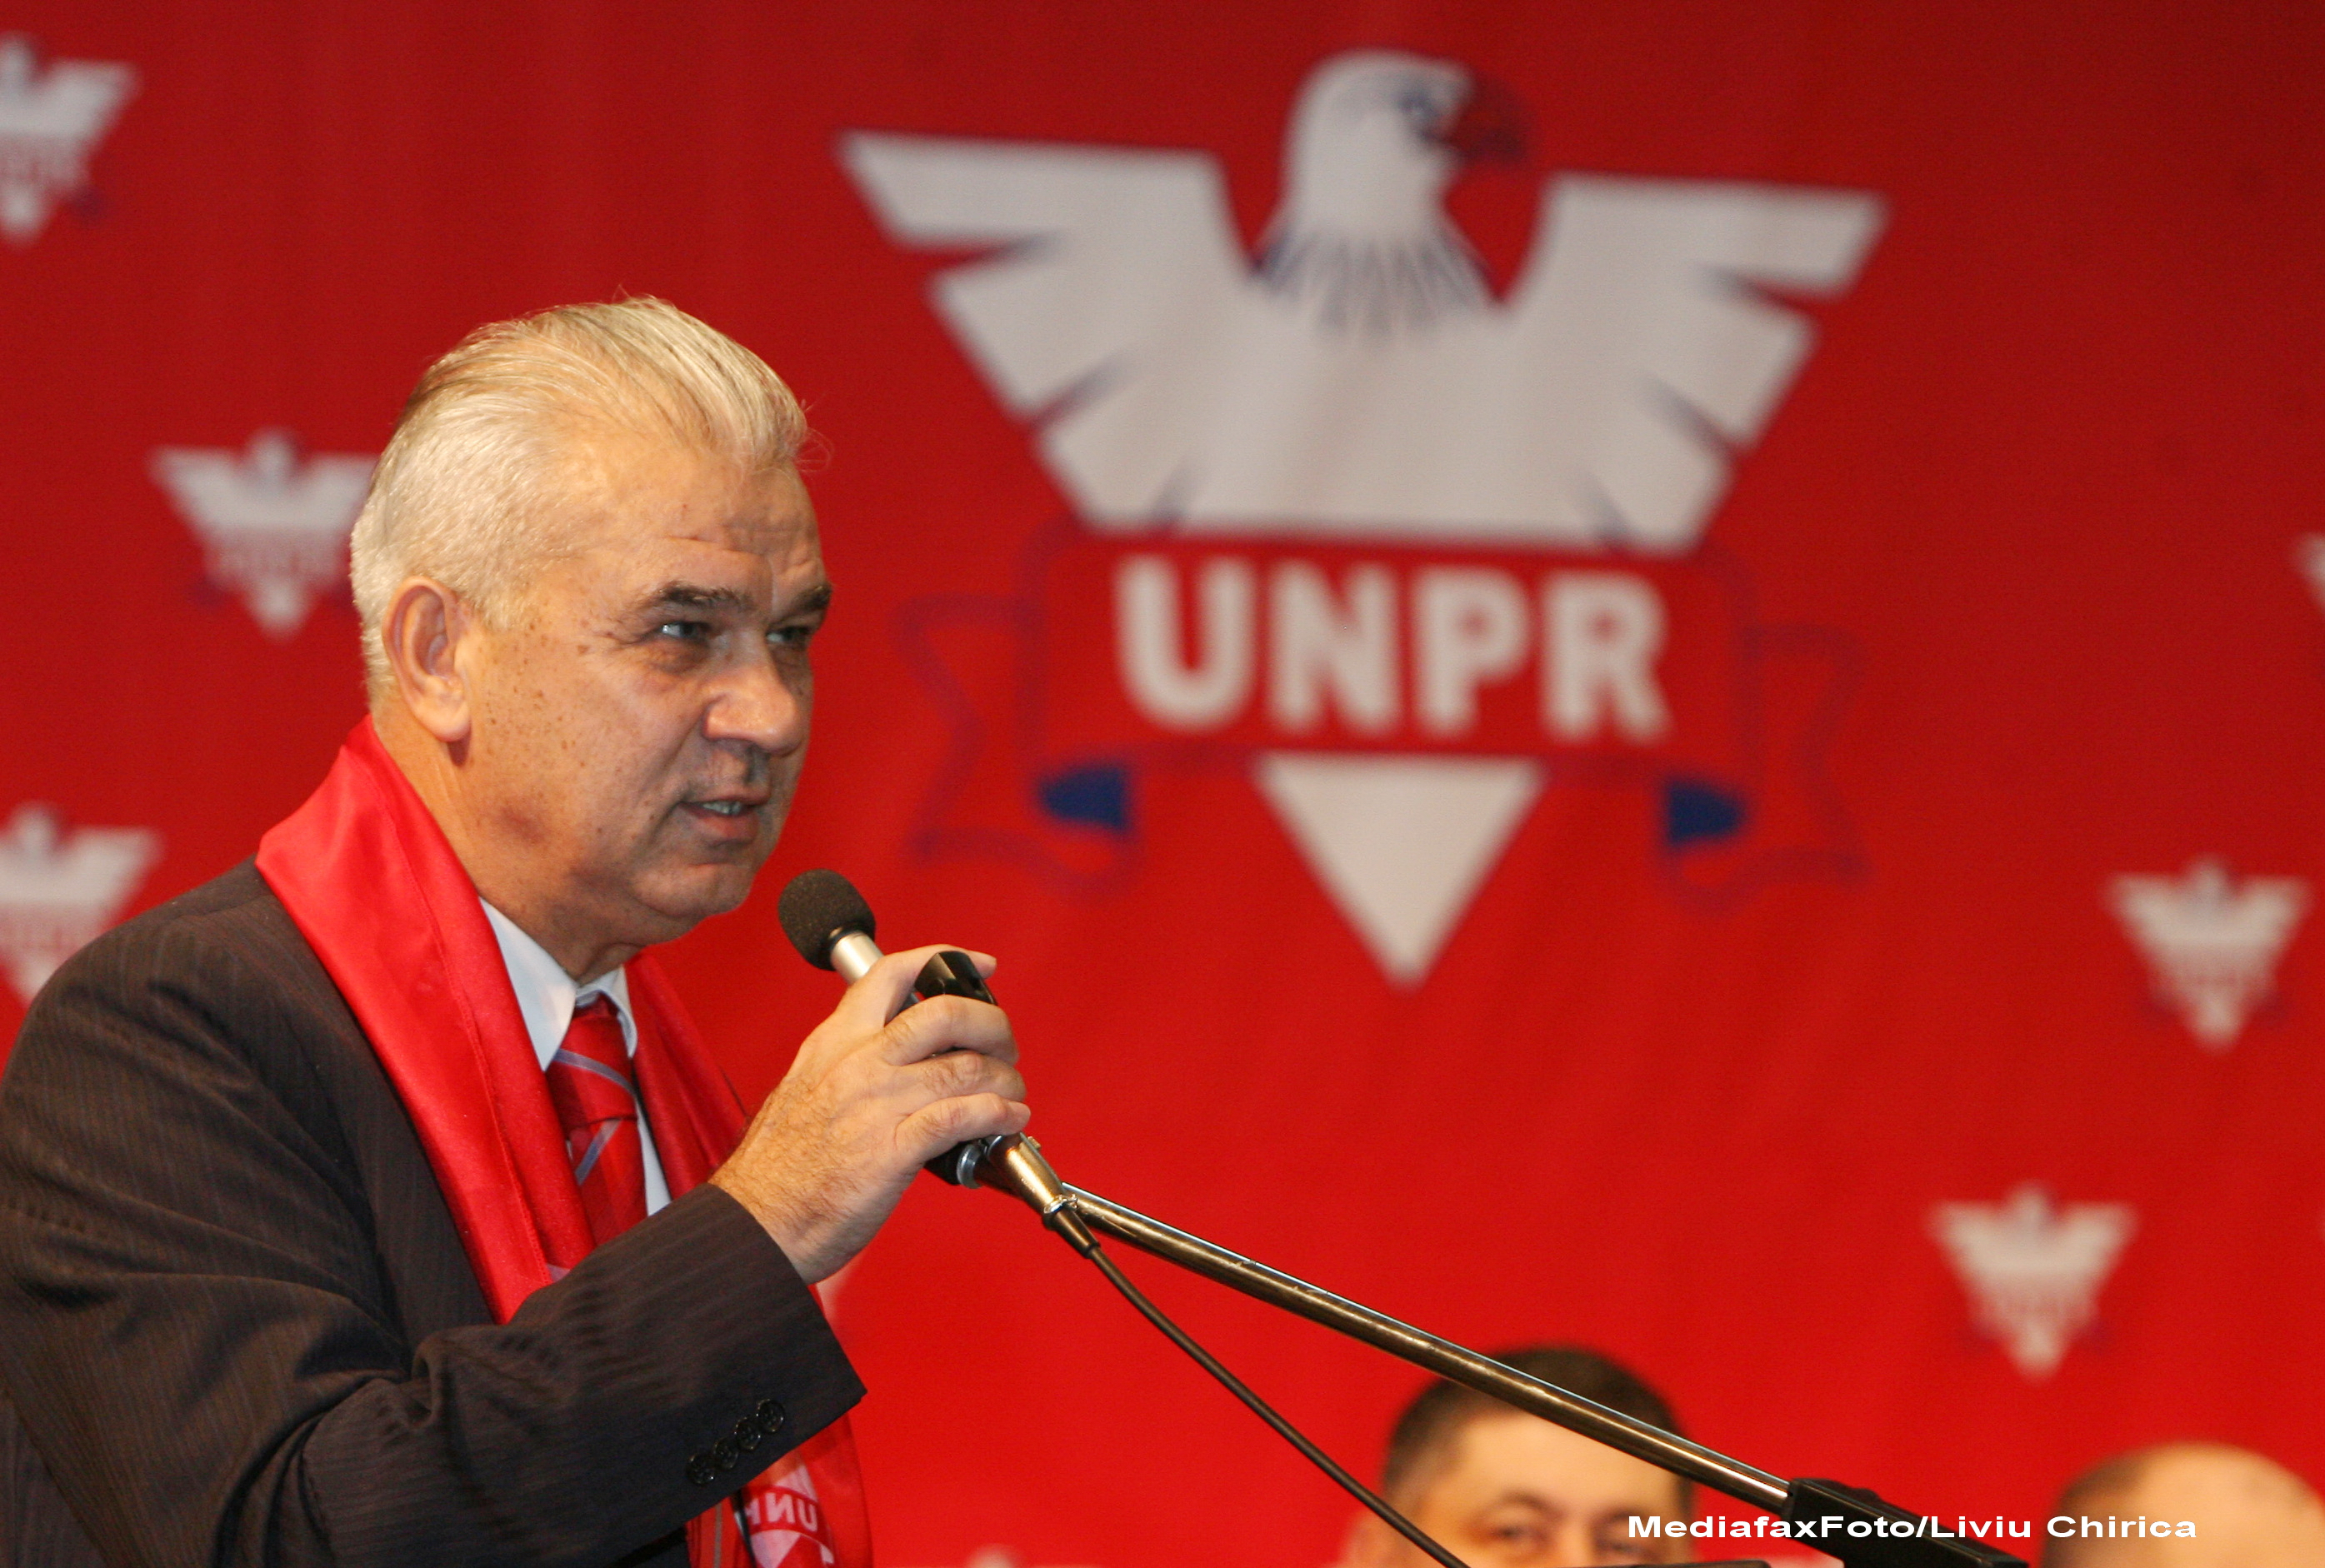 Alegeri locale 2012. Anghel Iordanescu si-a depus candidatura la Primaria Generala din partea UNPR